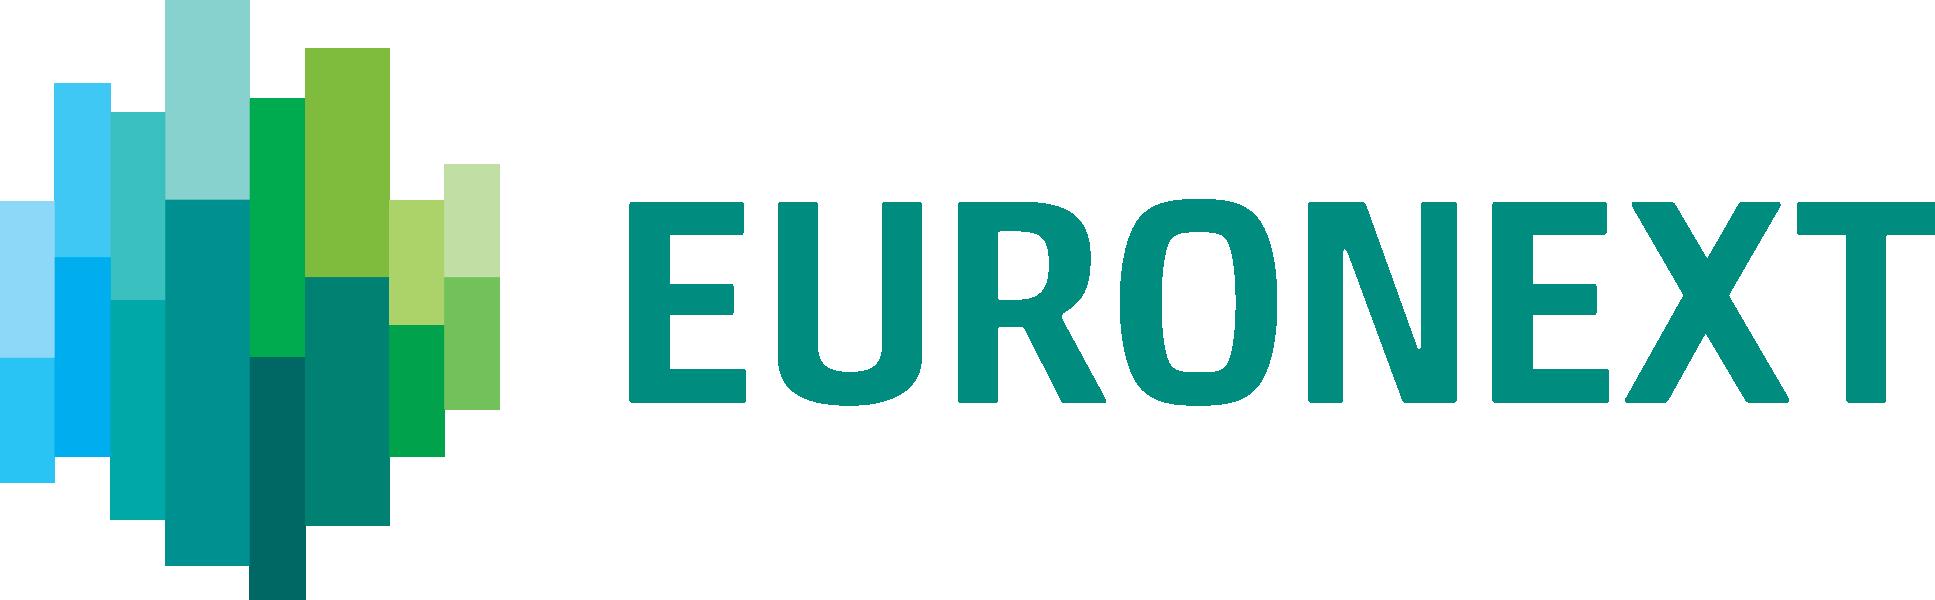 Euronext Technologies